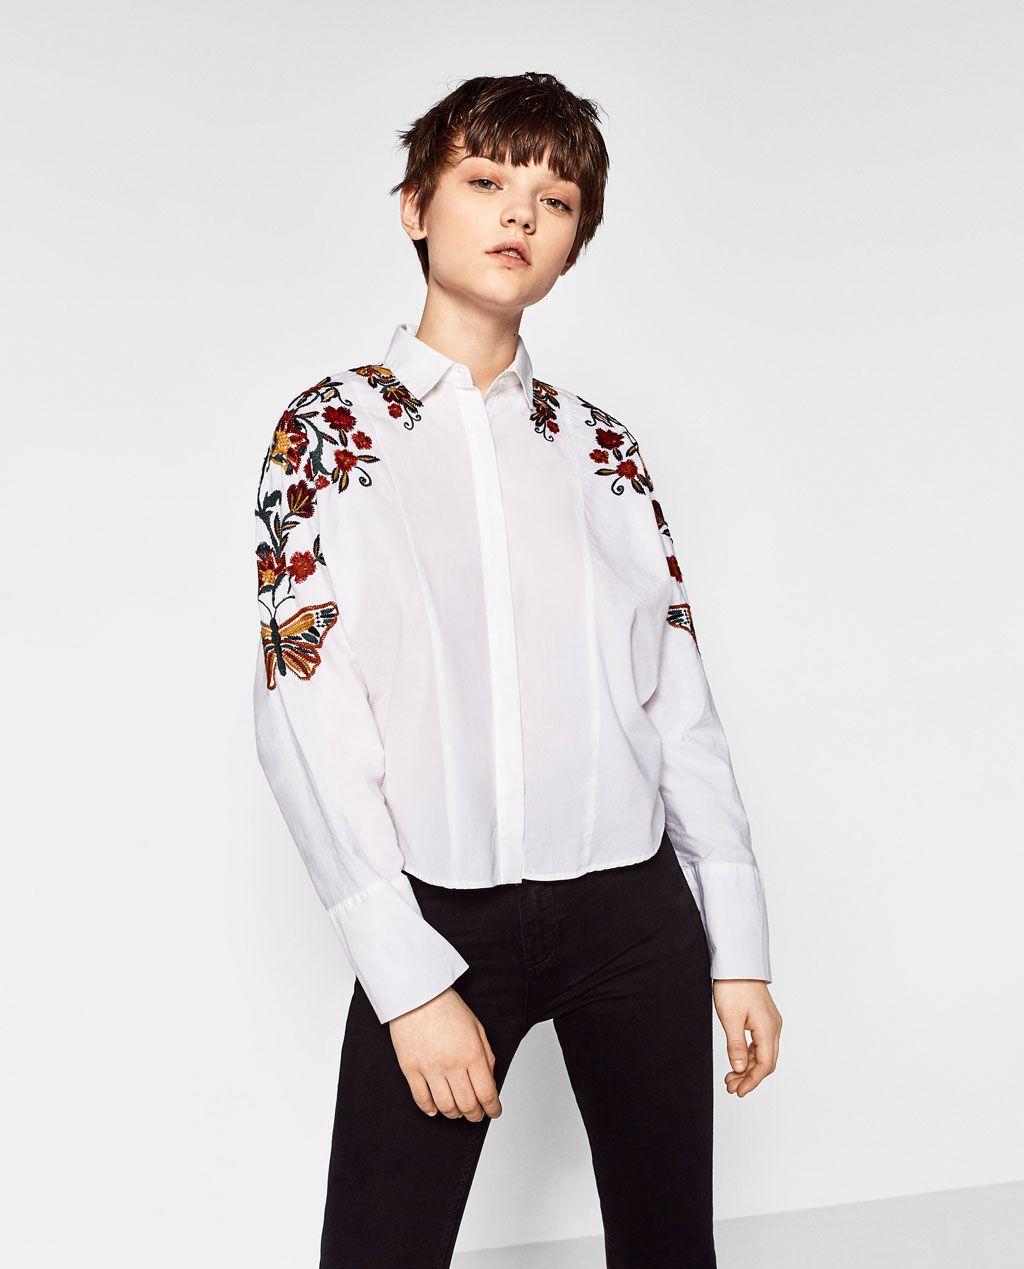 de119e0c9 Imagen 1 de CAMISA BORDADO FLORES de Zara   Zapatos   Camisas ...